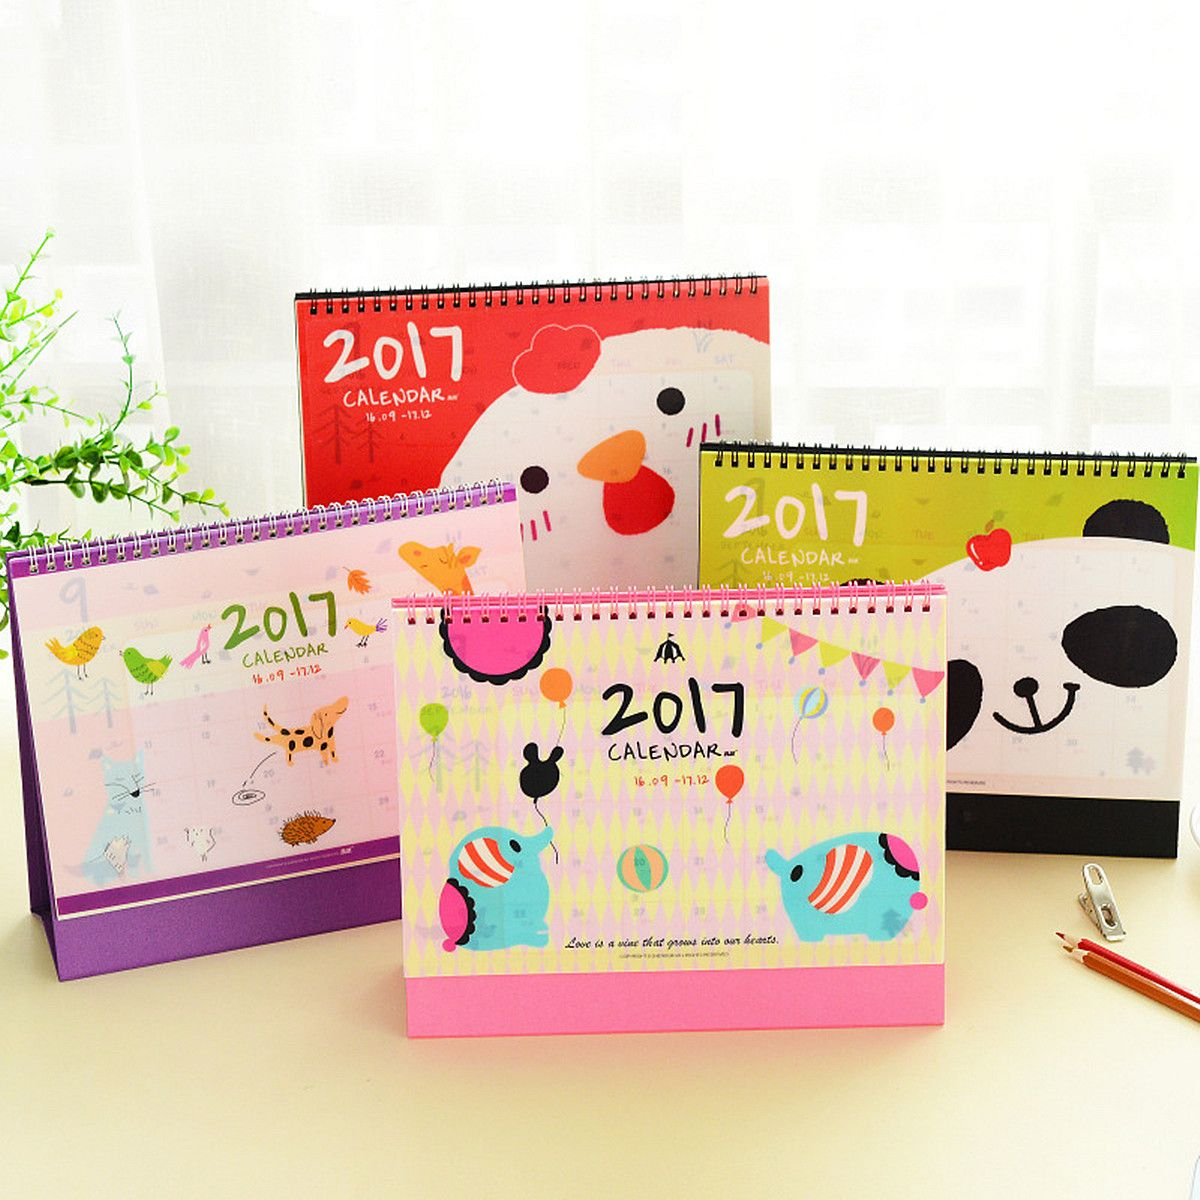 2017 Cute Cartoon Animal Desk Desktop Flip Stand Calendar Planner For Home Office